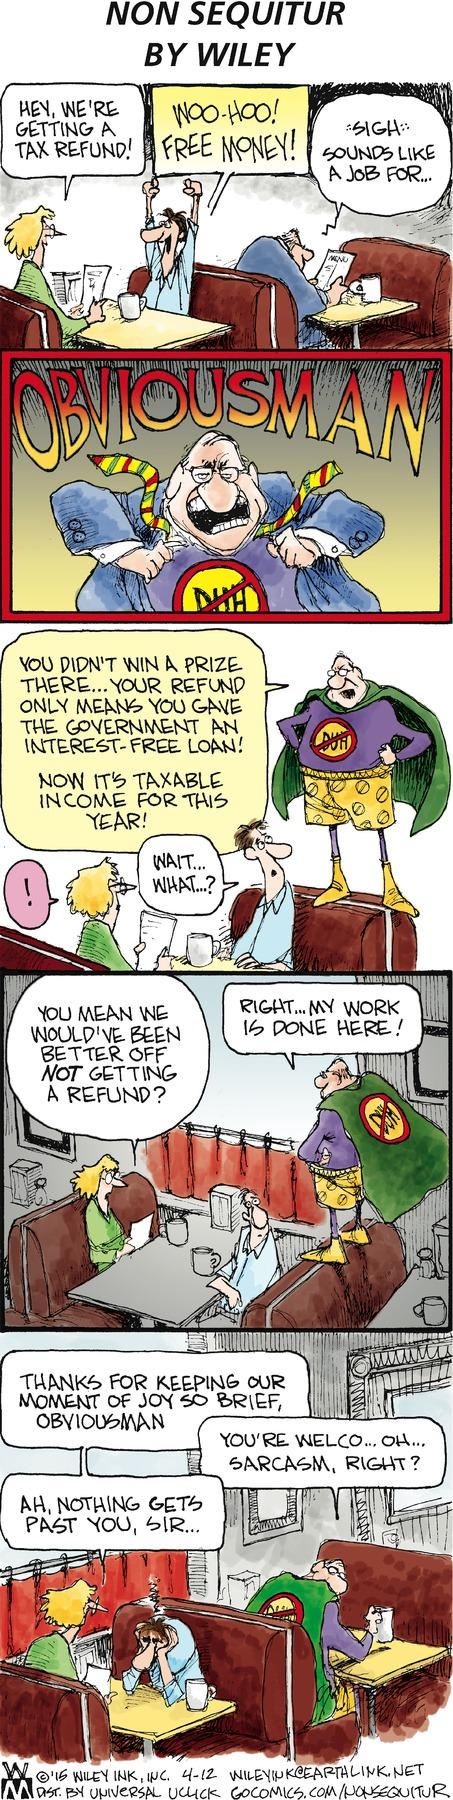 Non Sequitur Comic Strip for April 12, 2015